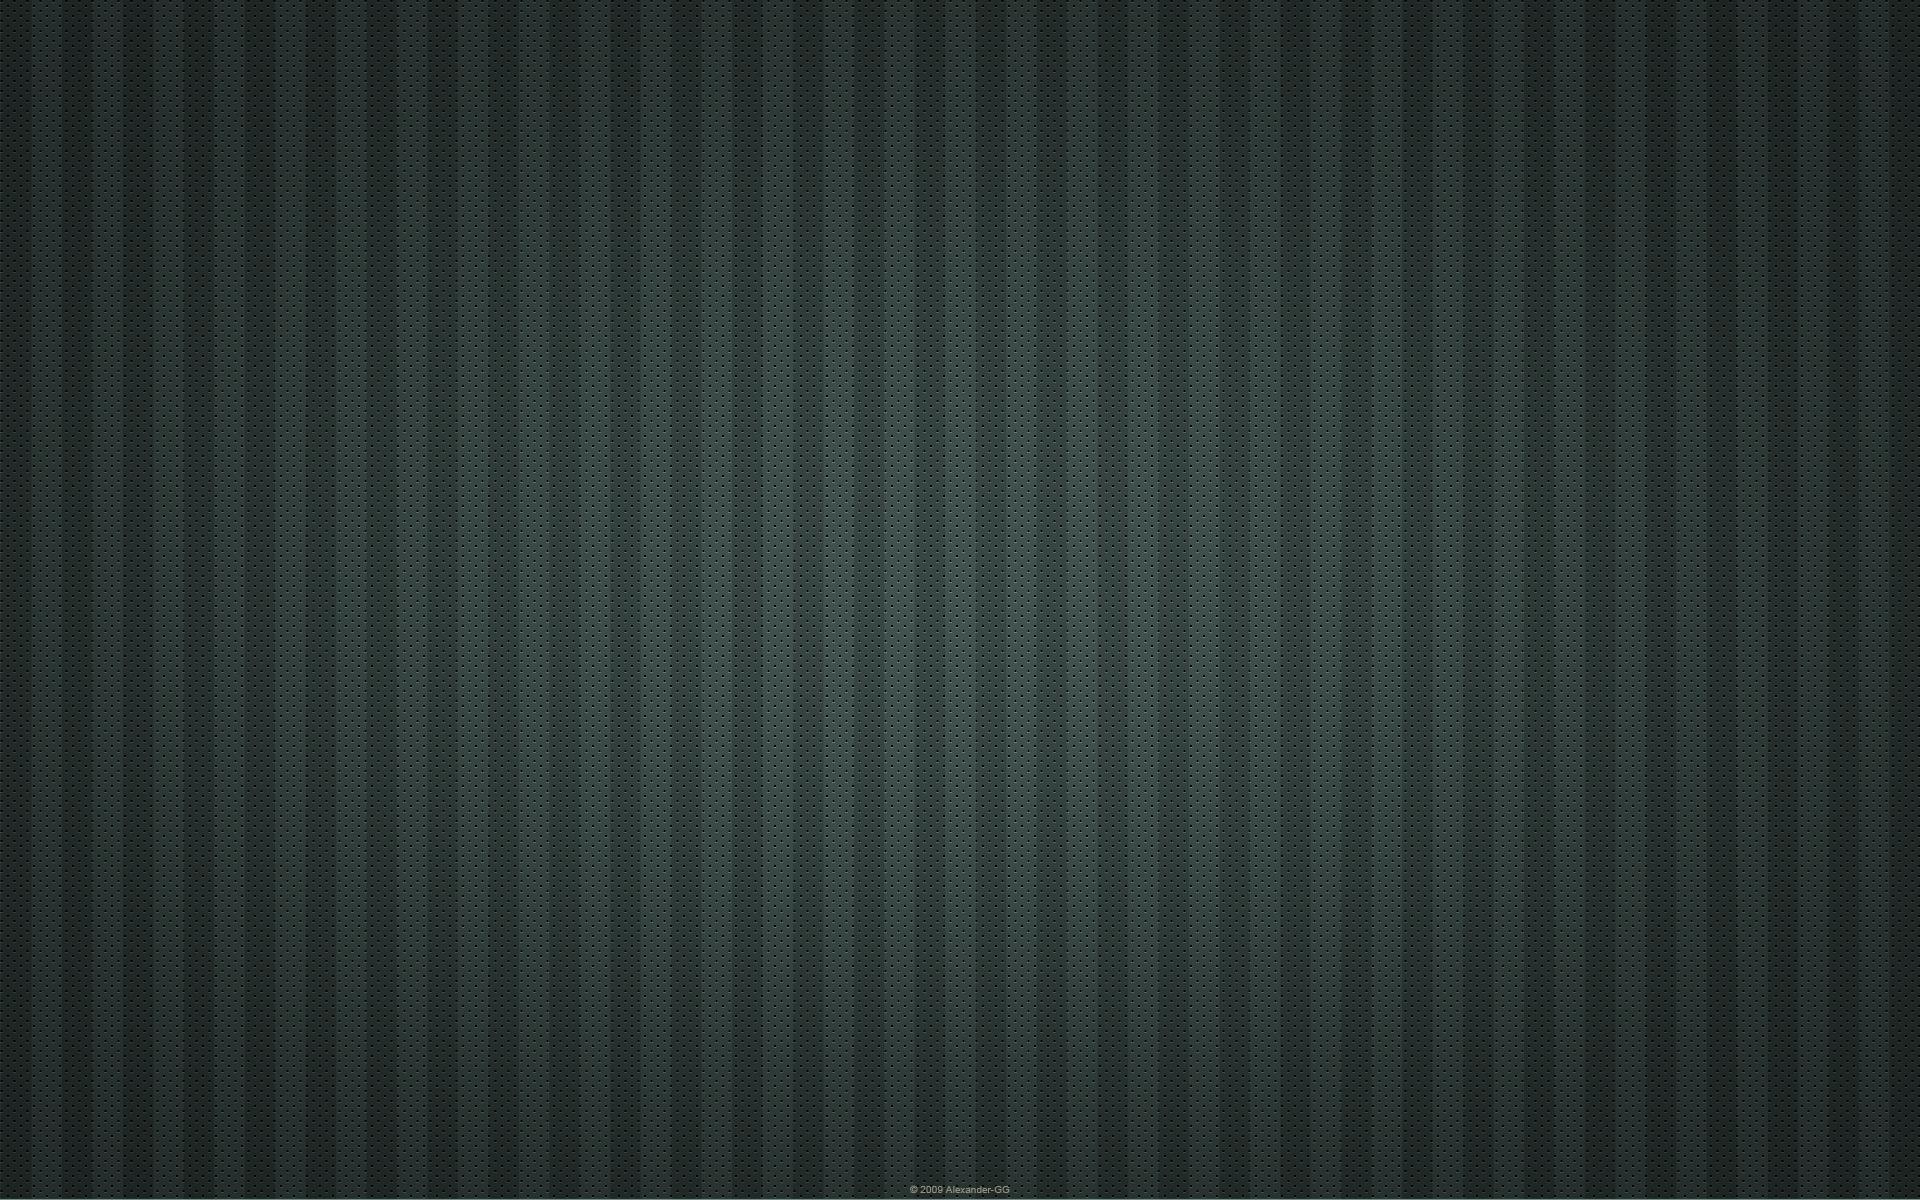 [Resim: lines_texture1103s8uoh.jpg]